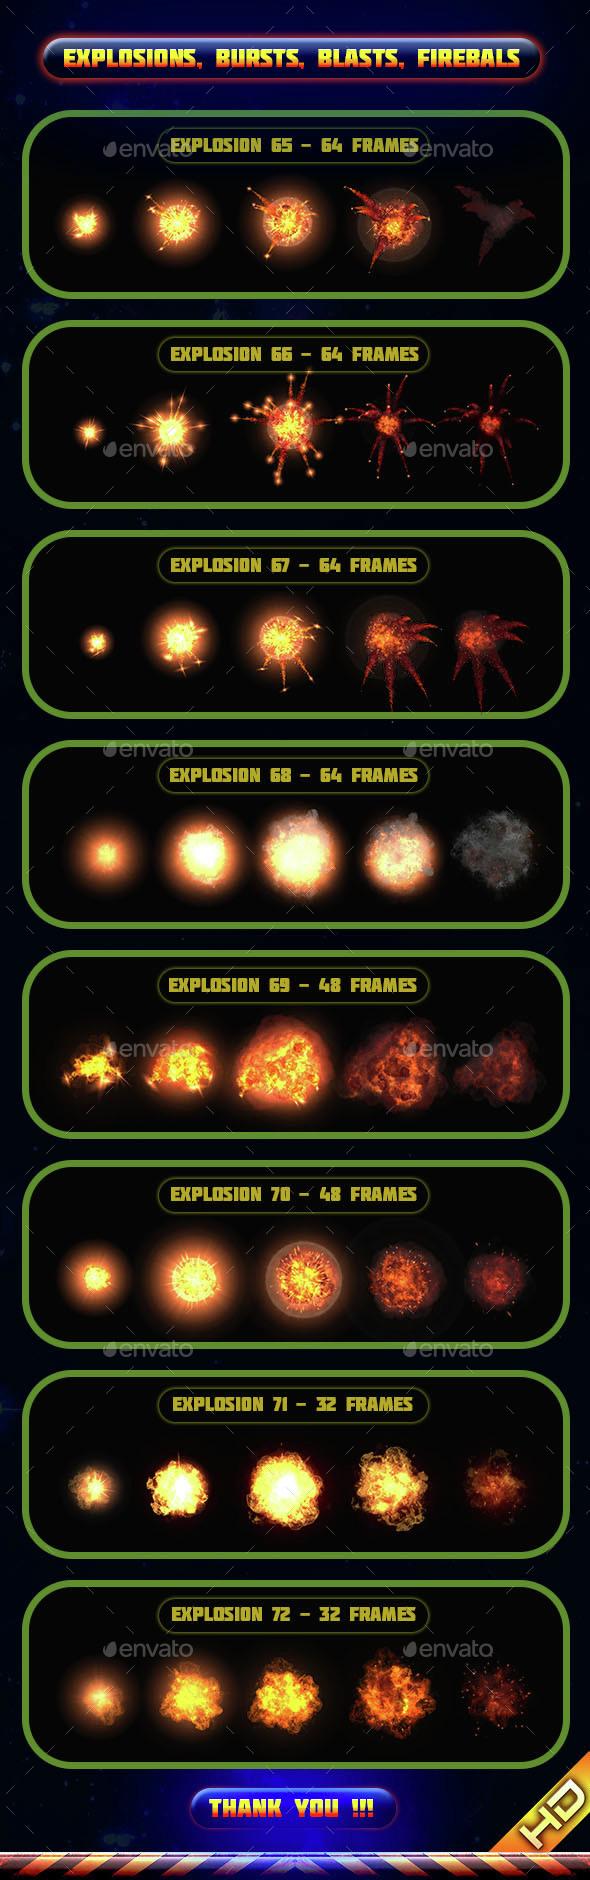 Explosions Blasts Bursts Detonations Fireballs 09 - Sprites Game Assets